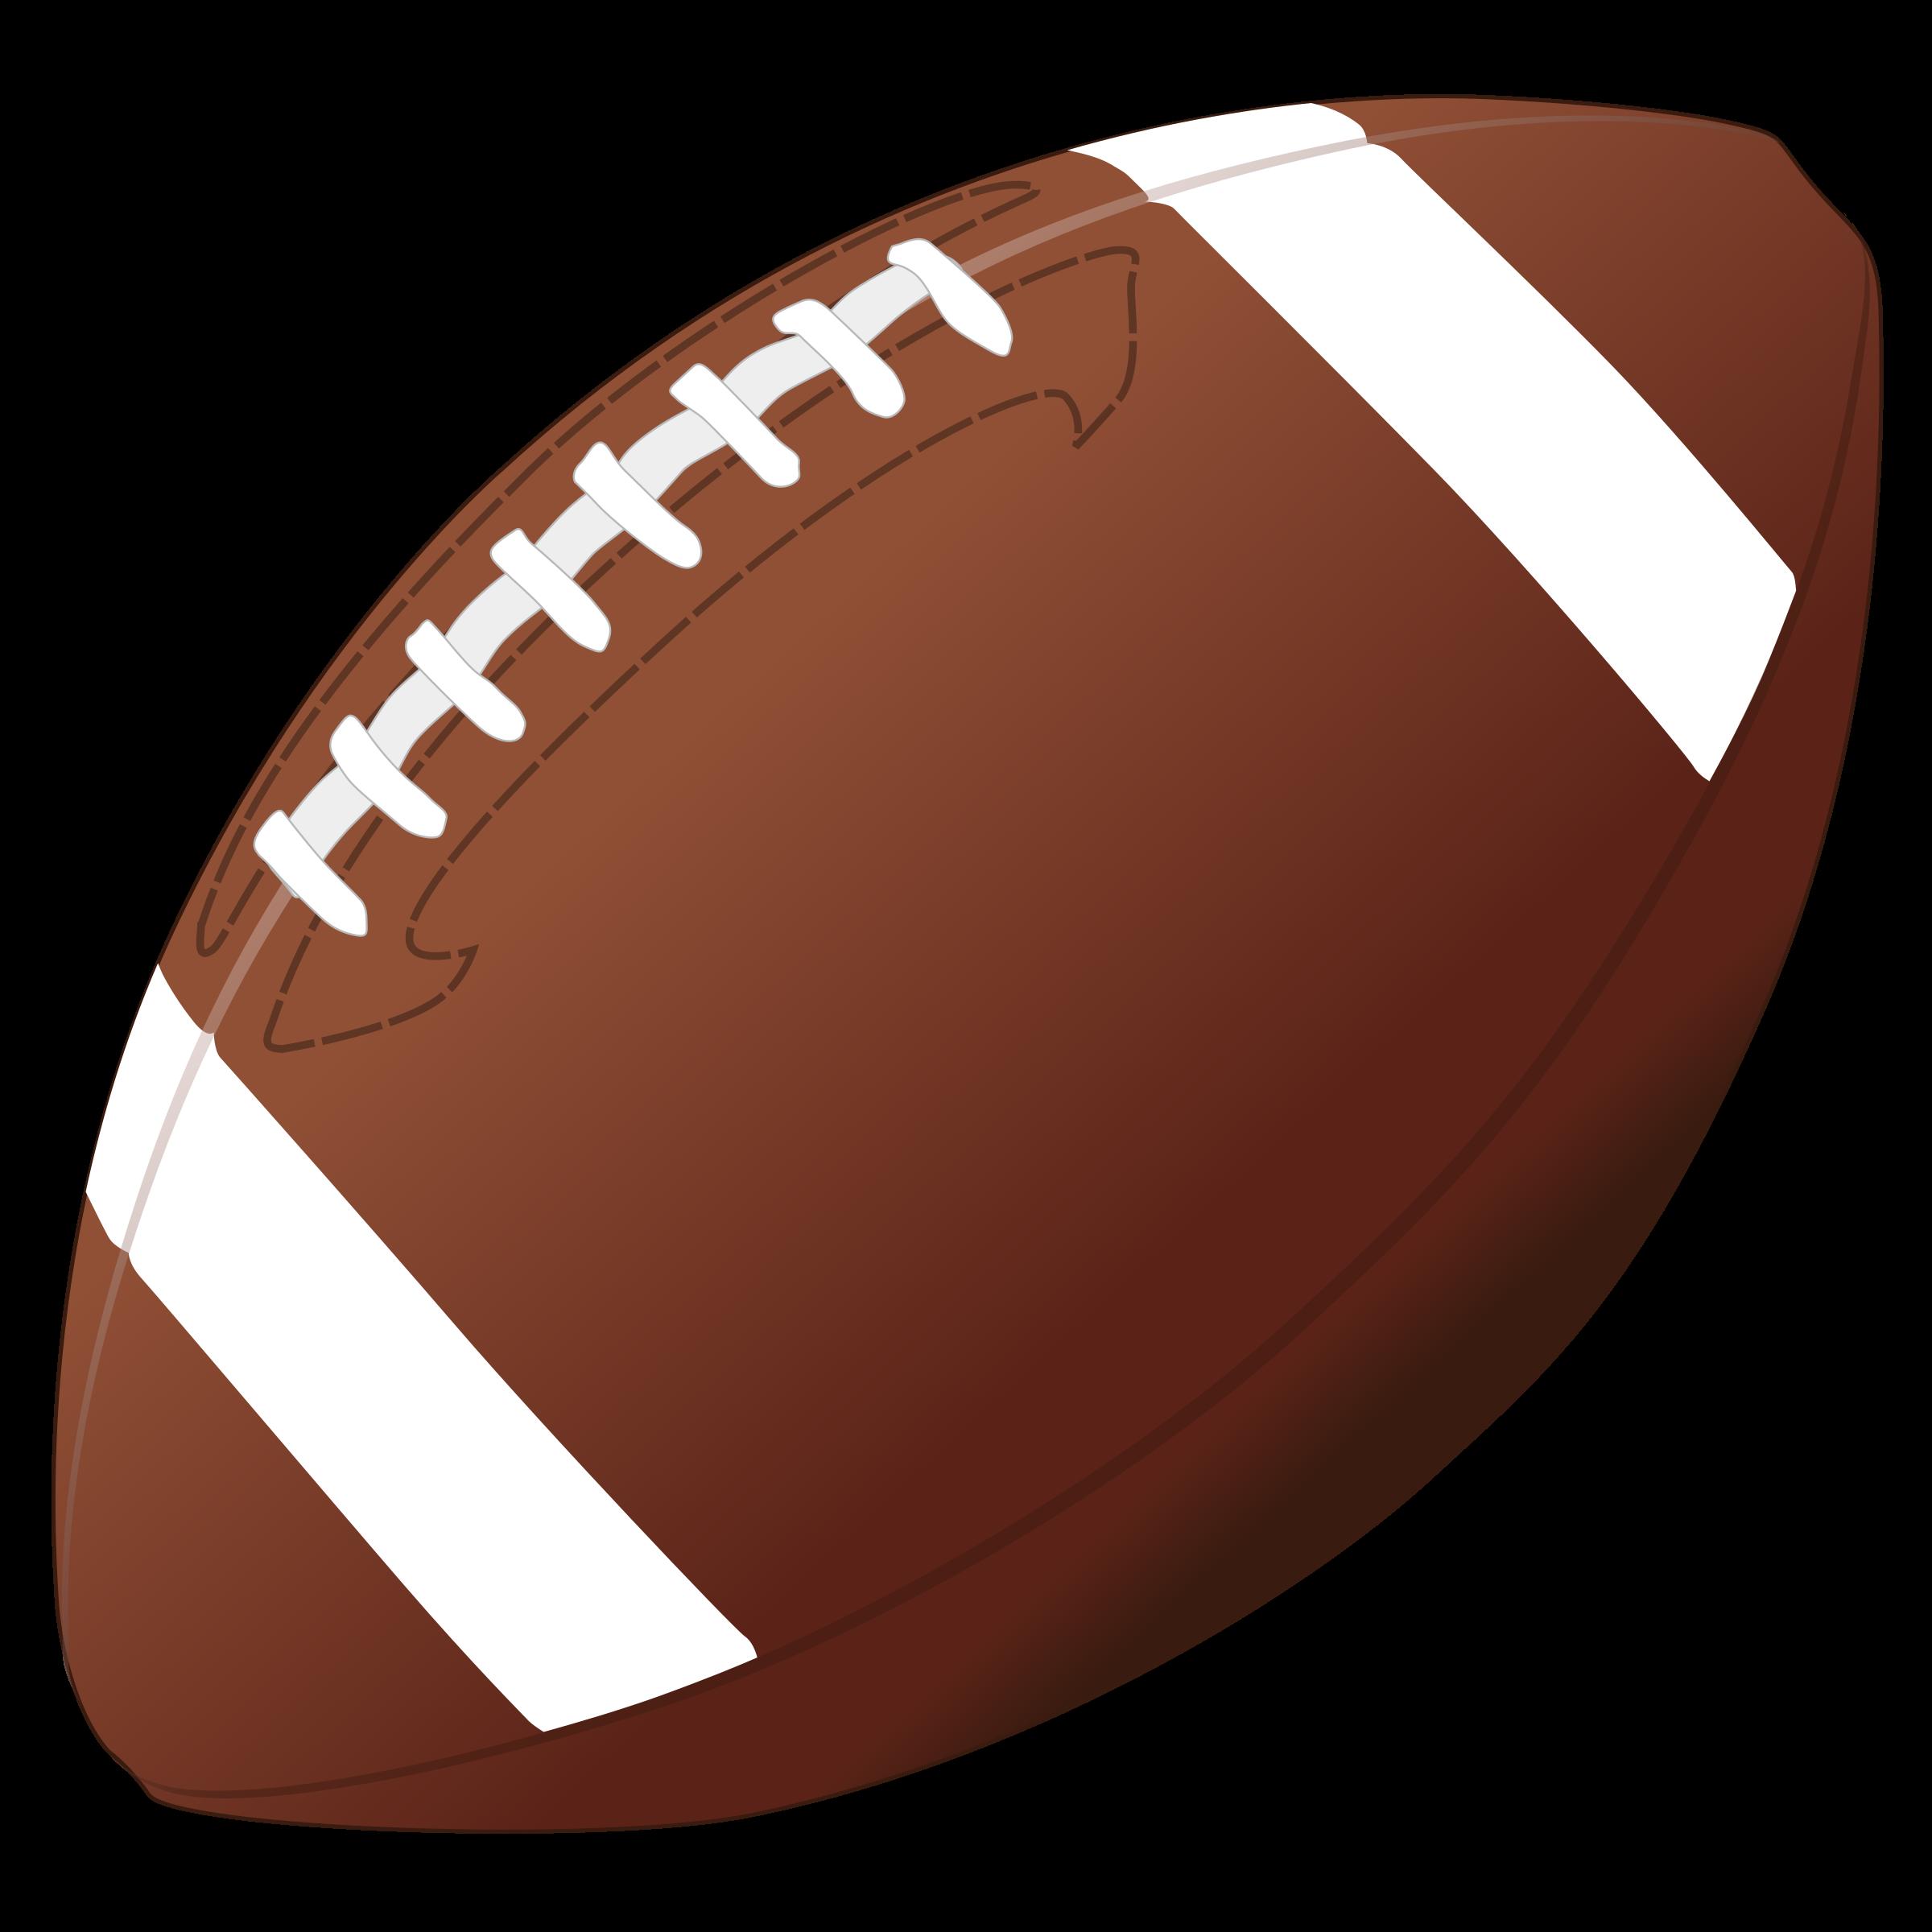 Clipart football clip art. Images qygjxz